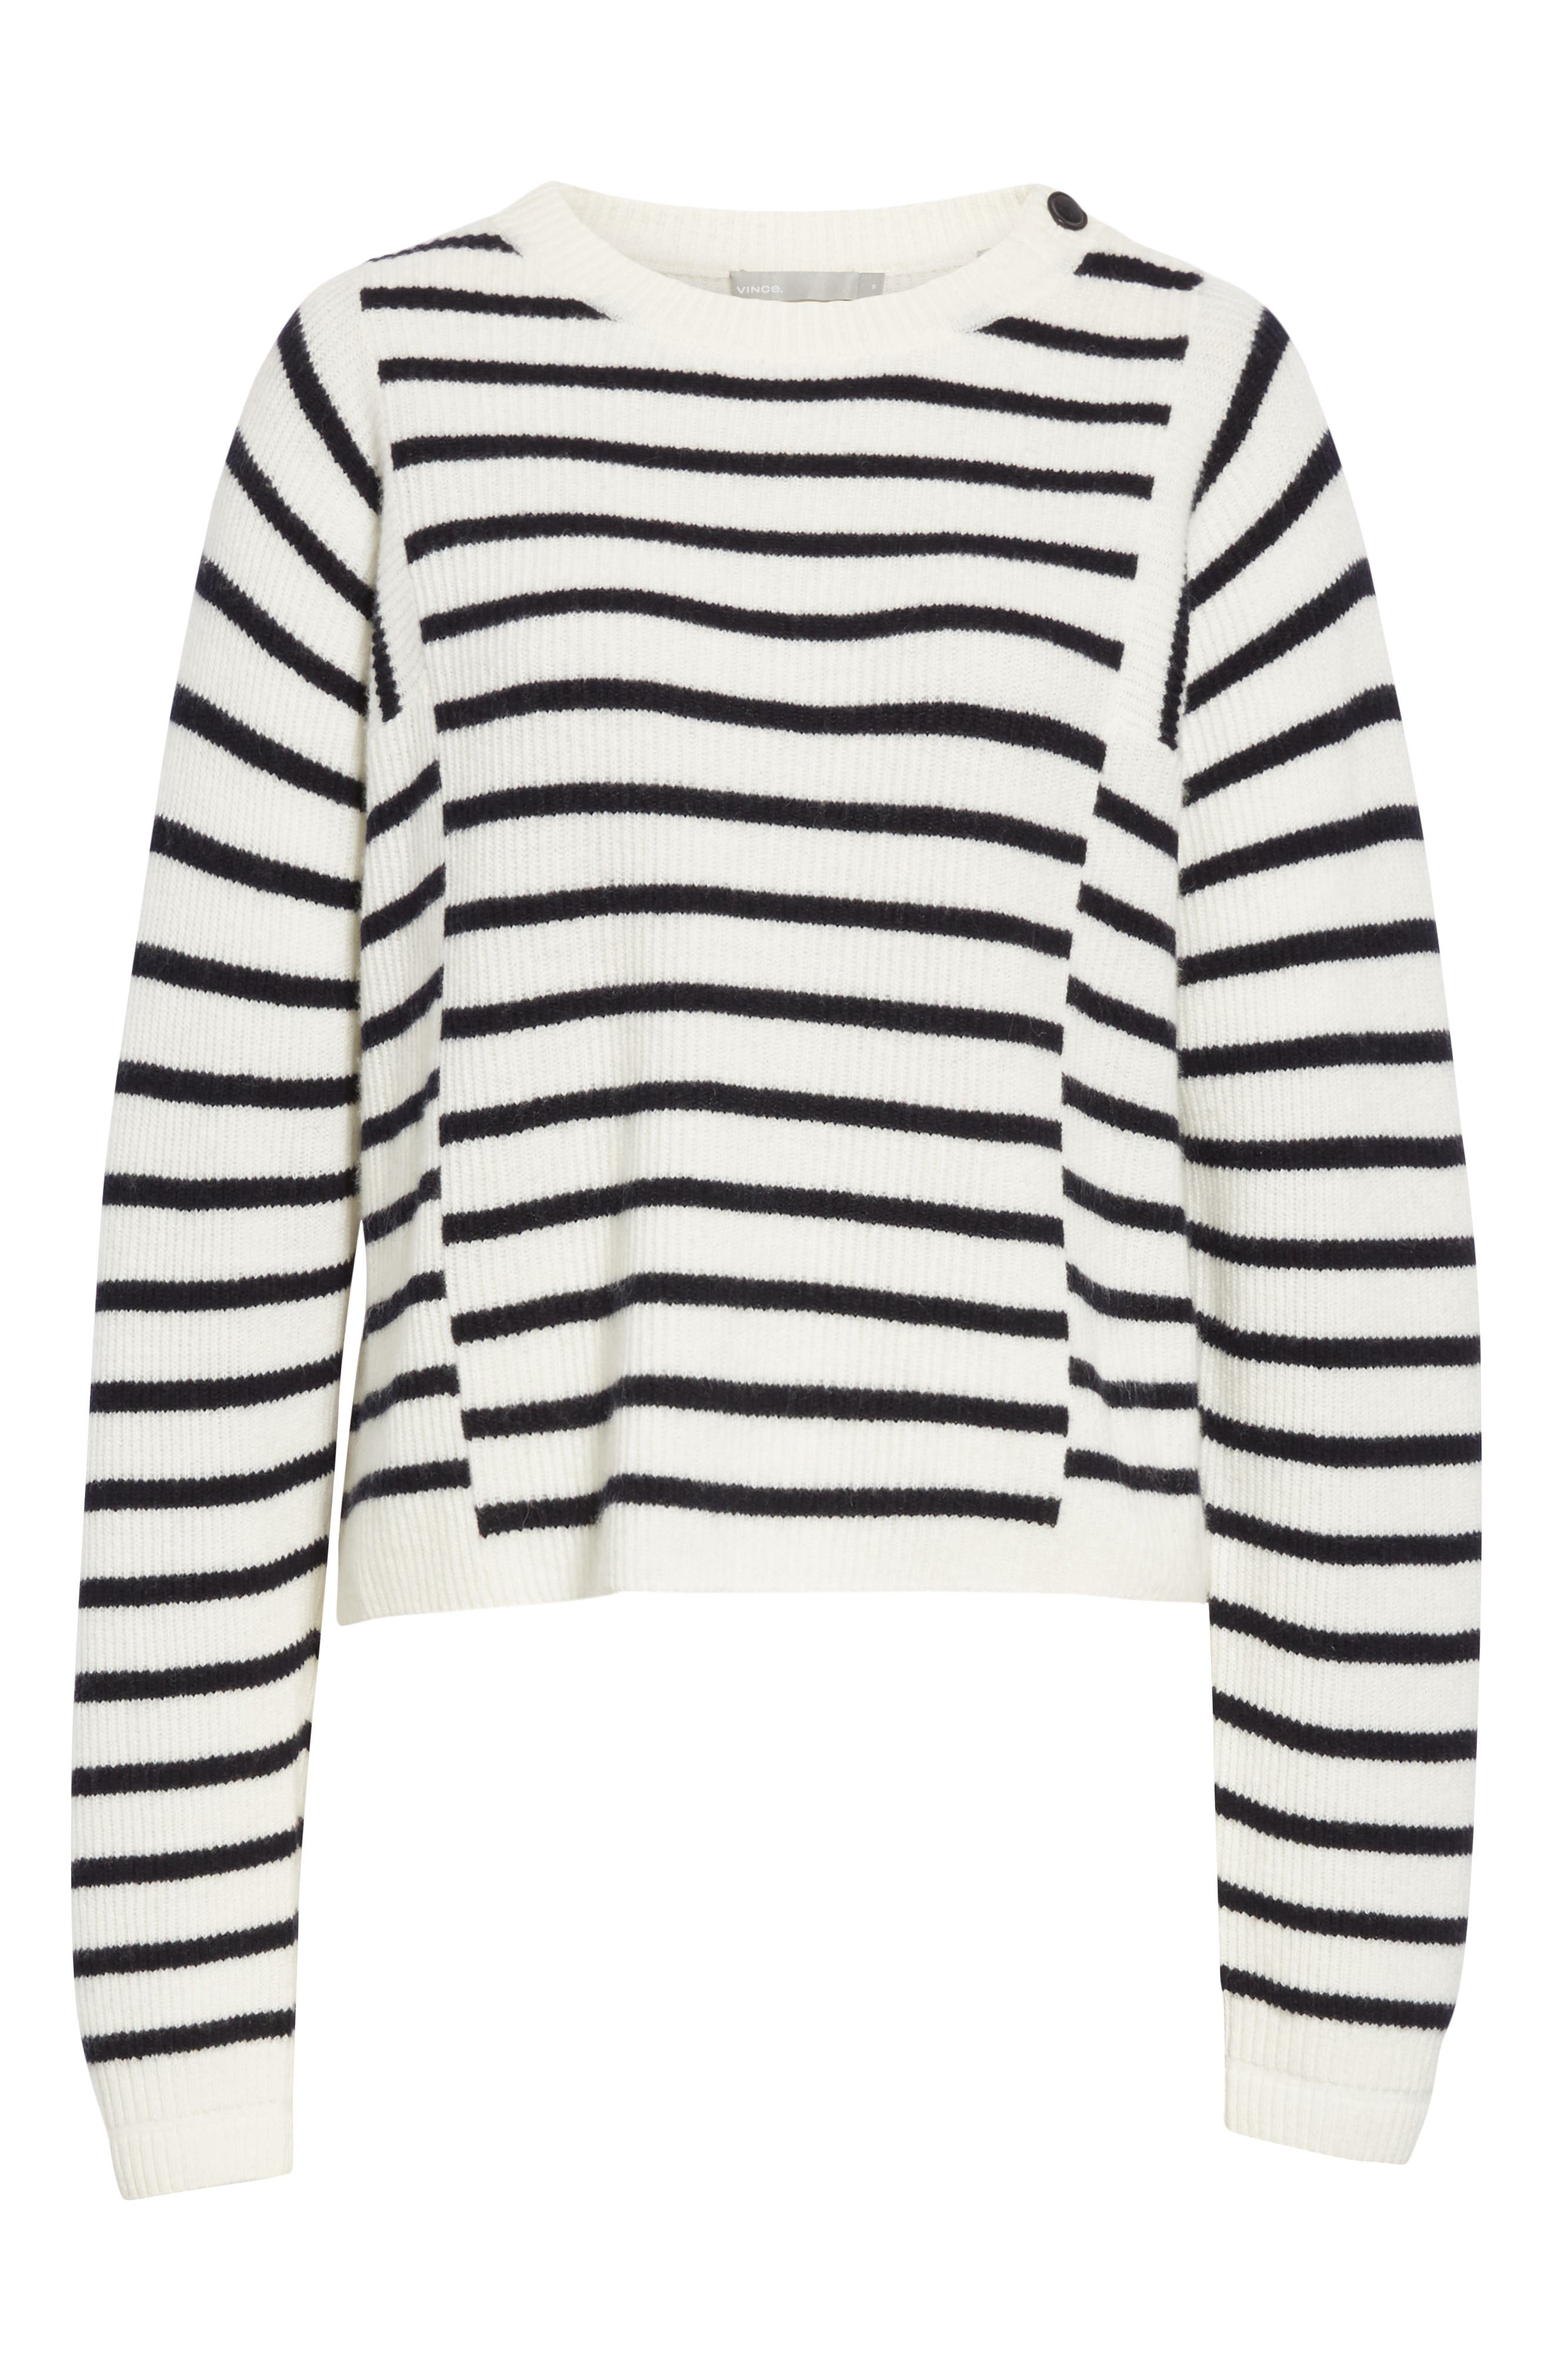 Mixed Stripe Sweater,                             Alternate thumbnail 6, color,                             OFF WHITE/ COASTAL